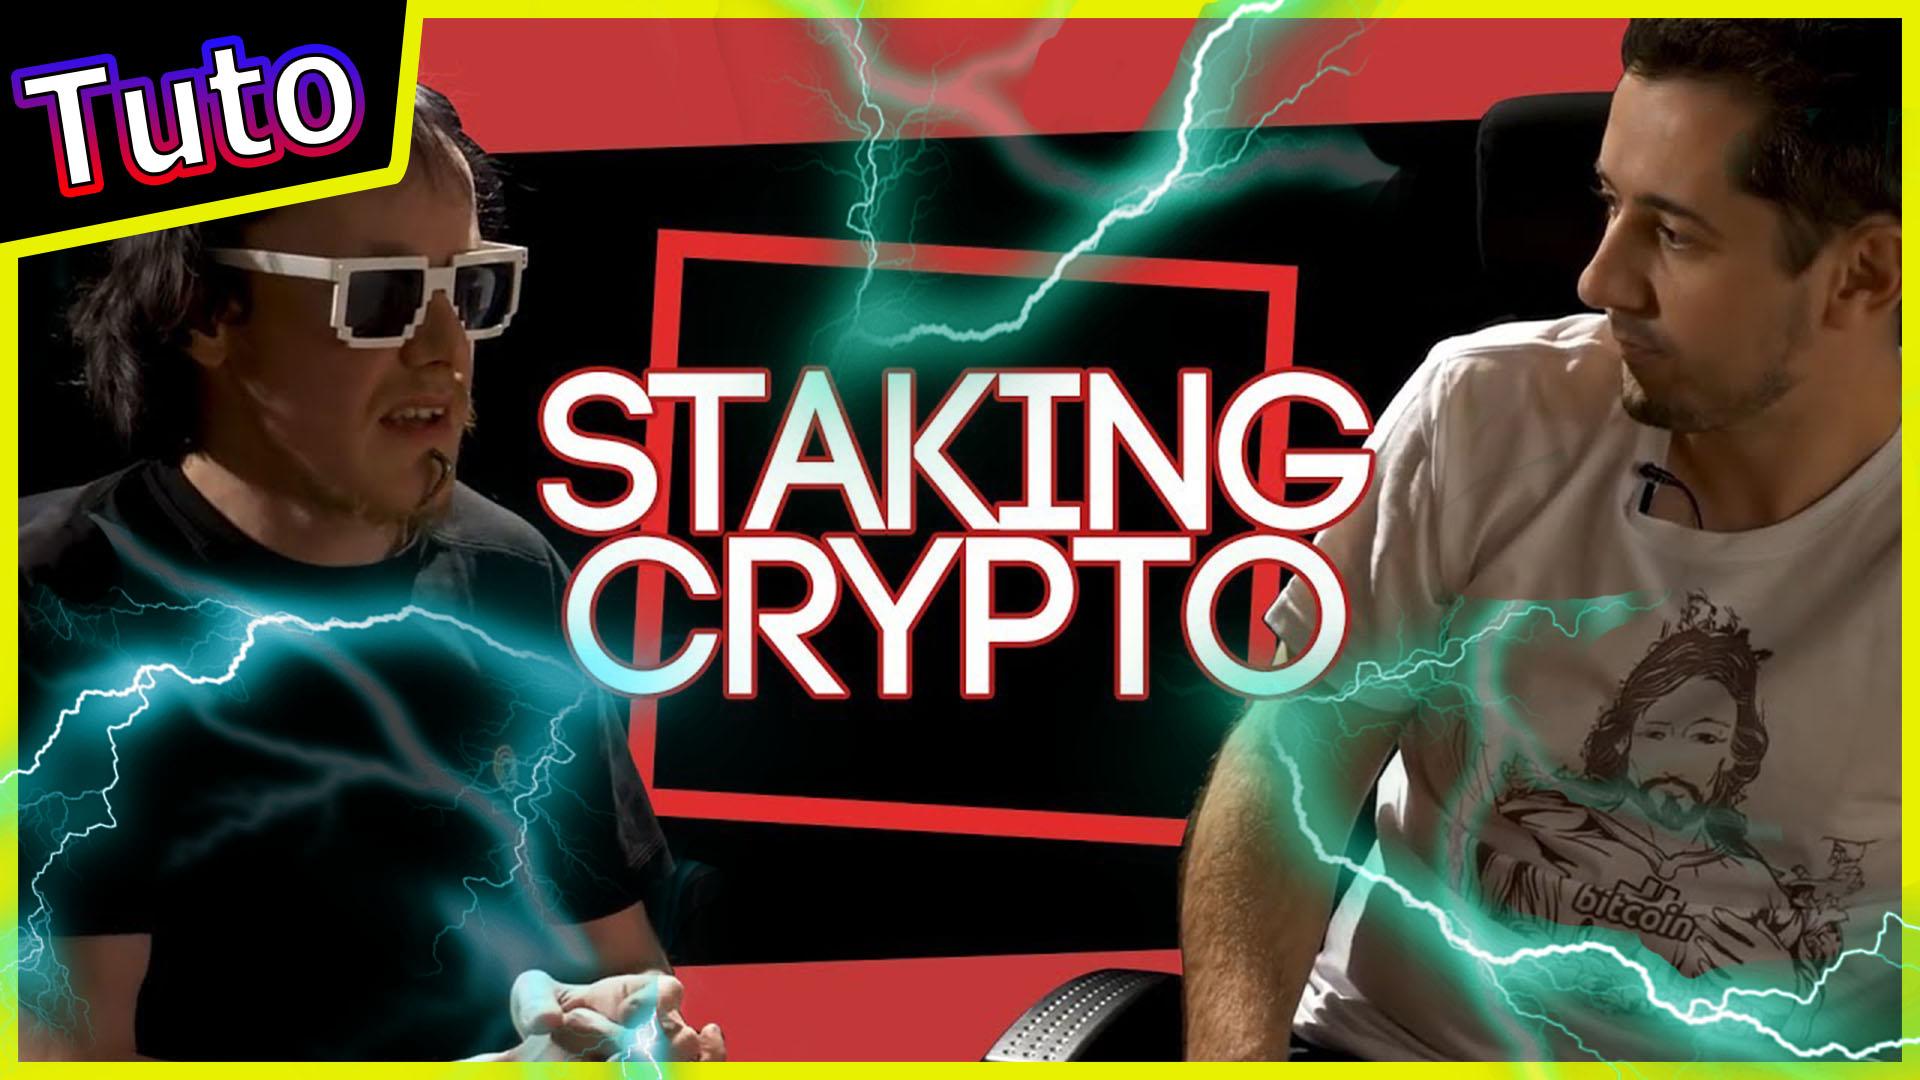 Staking cryptomonnaie en 8mn #bitcoin #altcoin